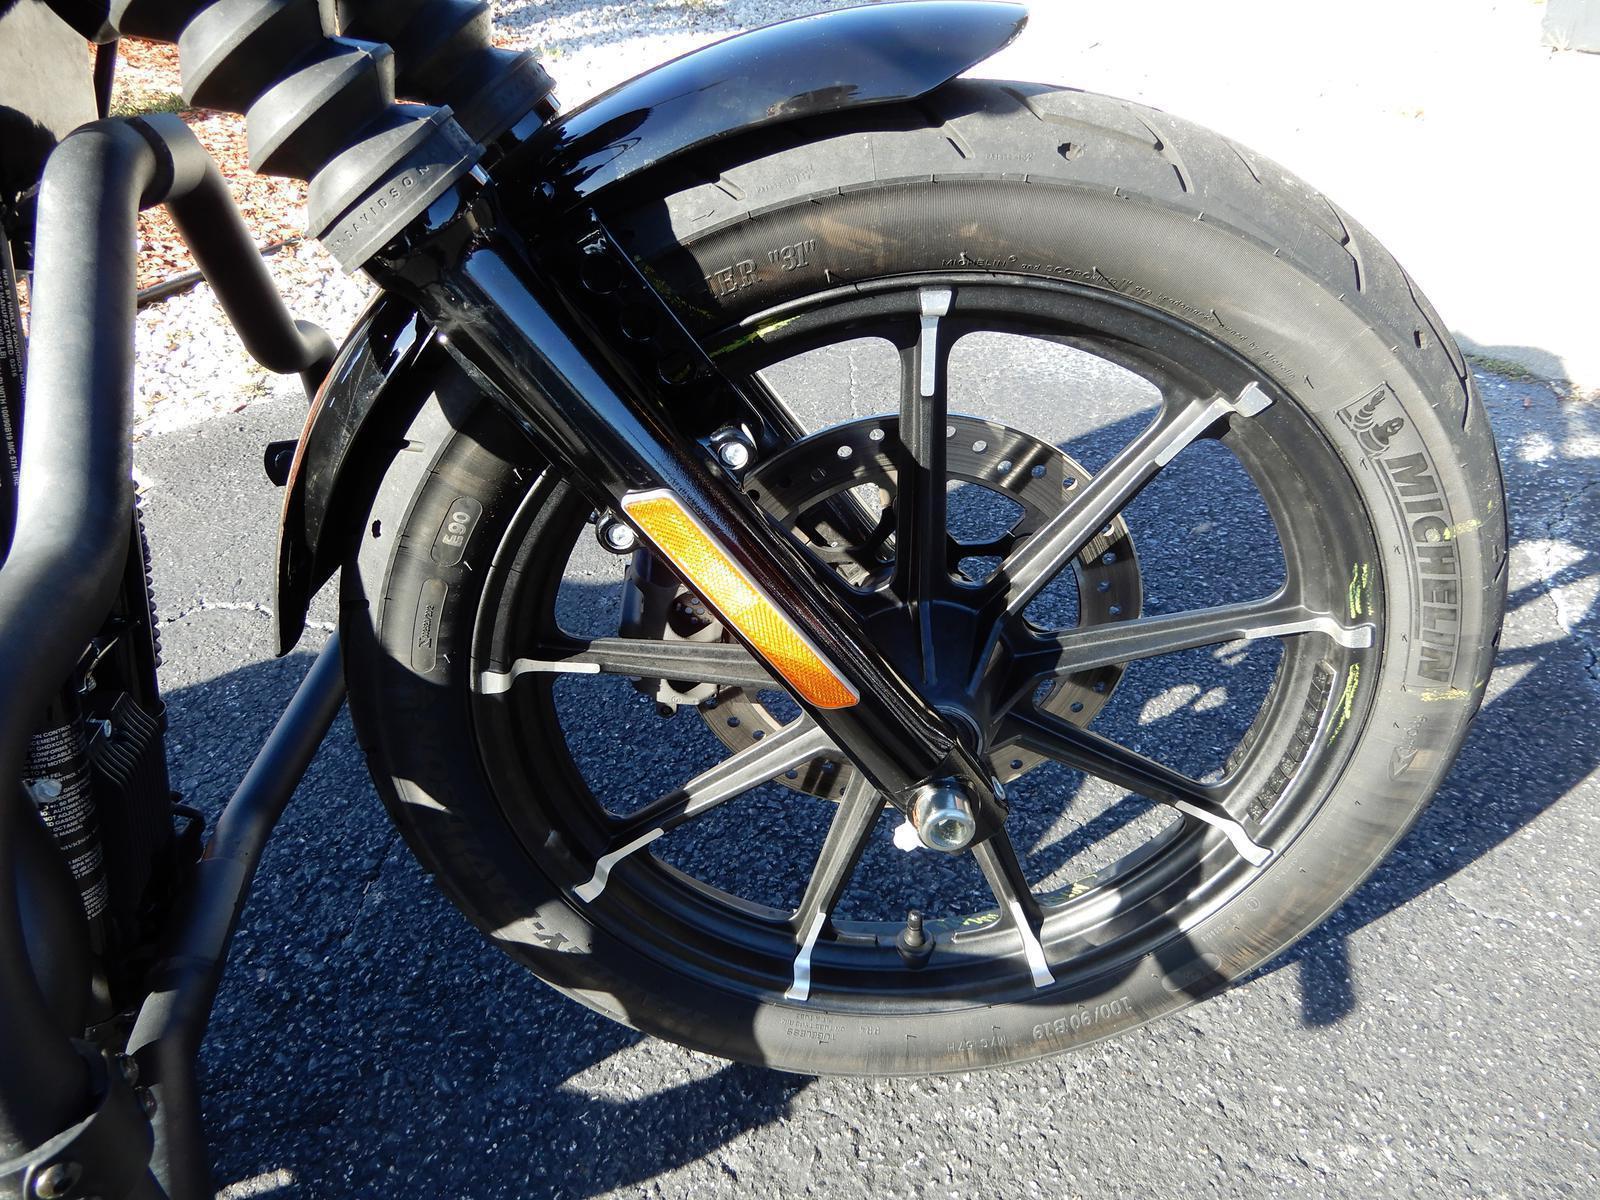 2016 Harley Davidson Sportster Iron 883 For Sale In Myrtle Beach Wire Harness A 73 Ironhead Dscn4292